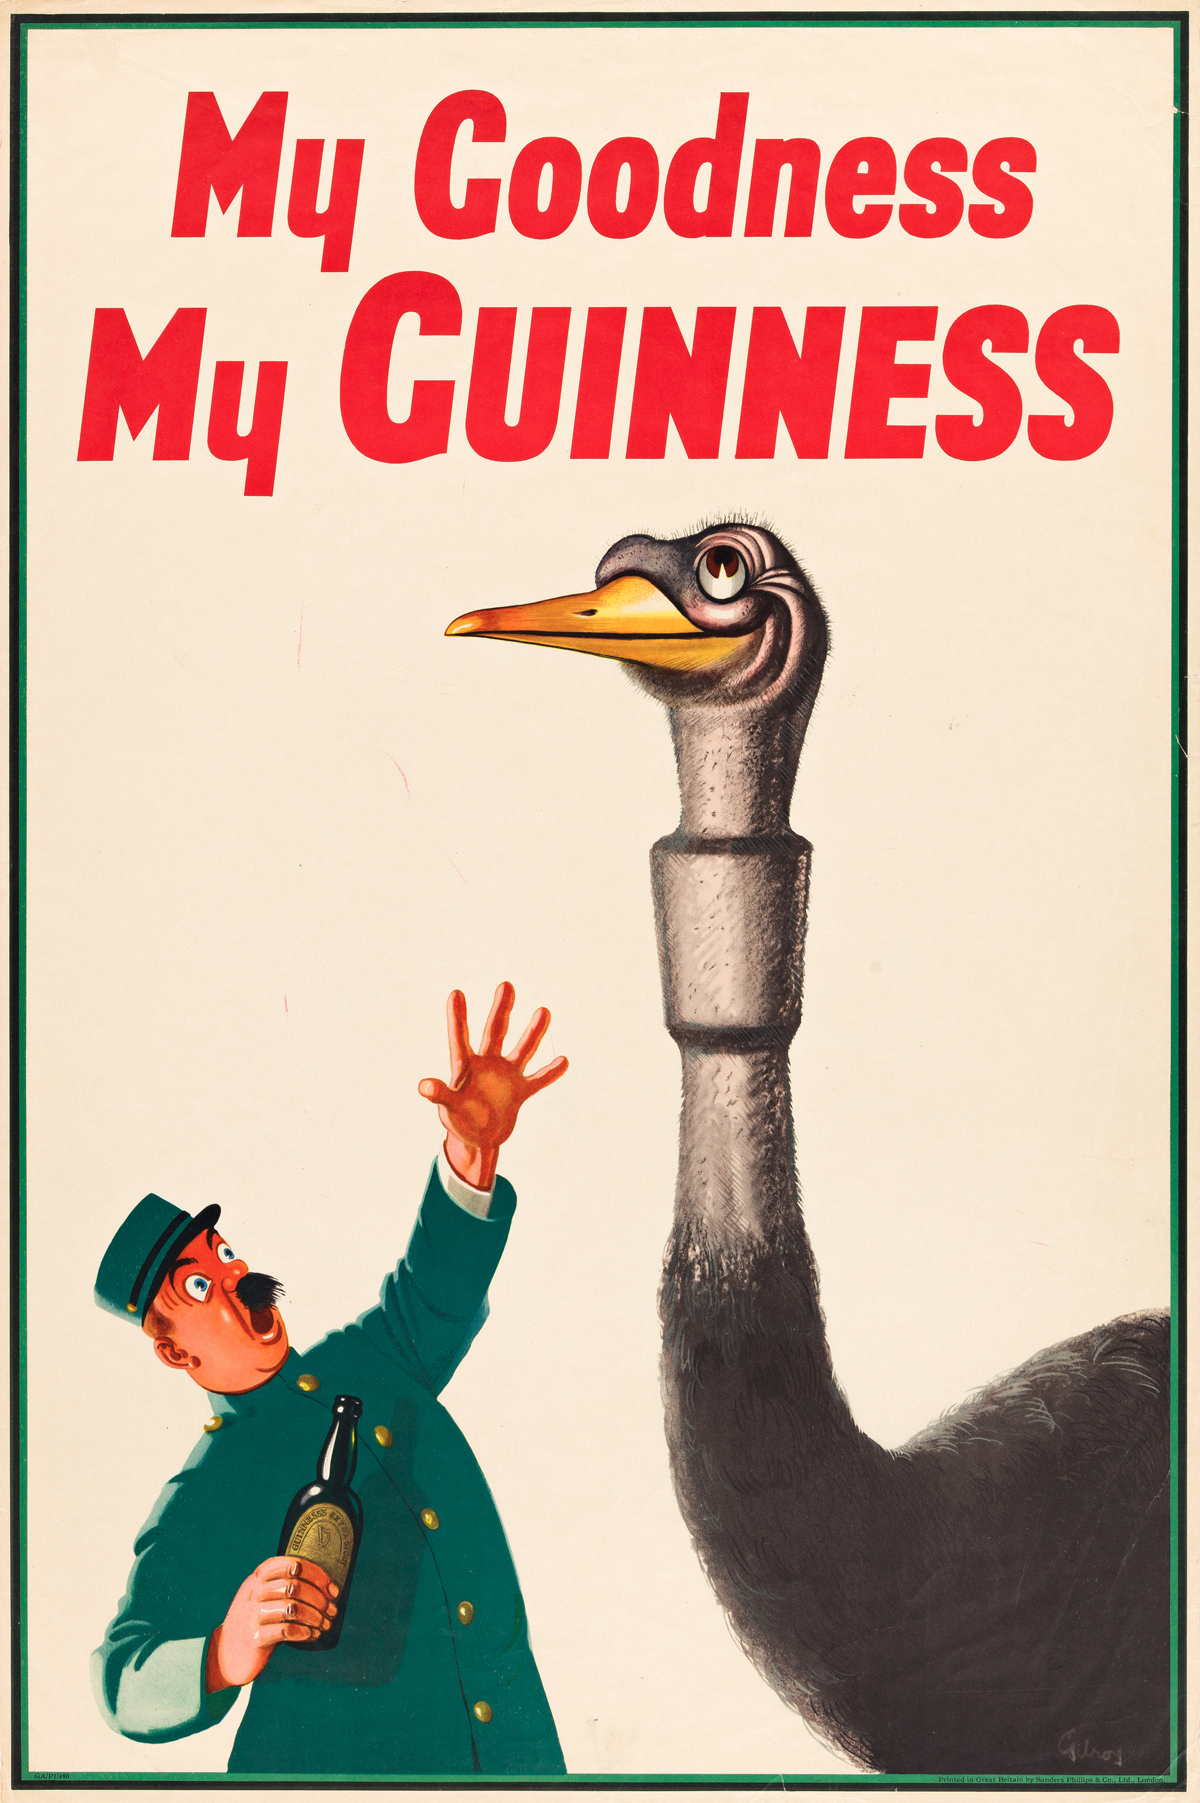 JOHN GILROY (1898-1985).  MY GOODNESS MY GUINNESS. 1936. 30x20 inches, 76x50 cm. Sanders Phillips & Co., Ltd., London.